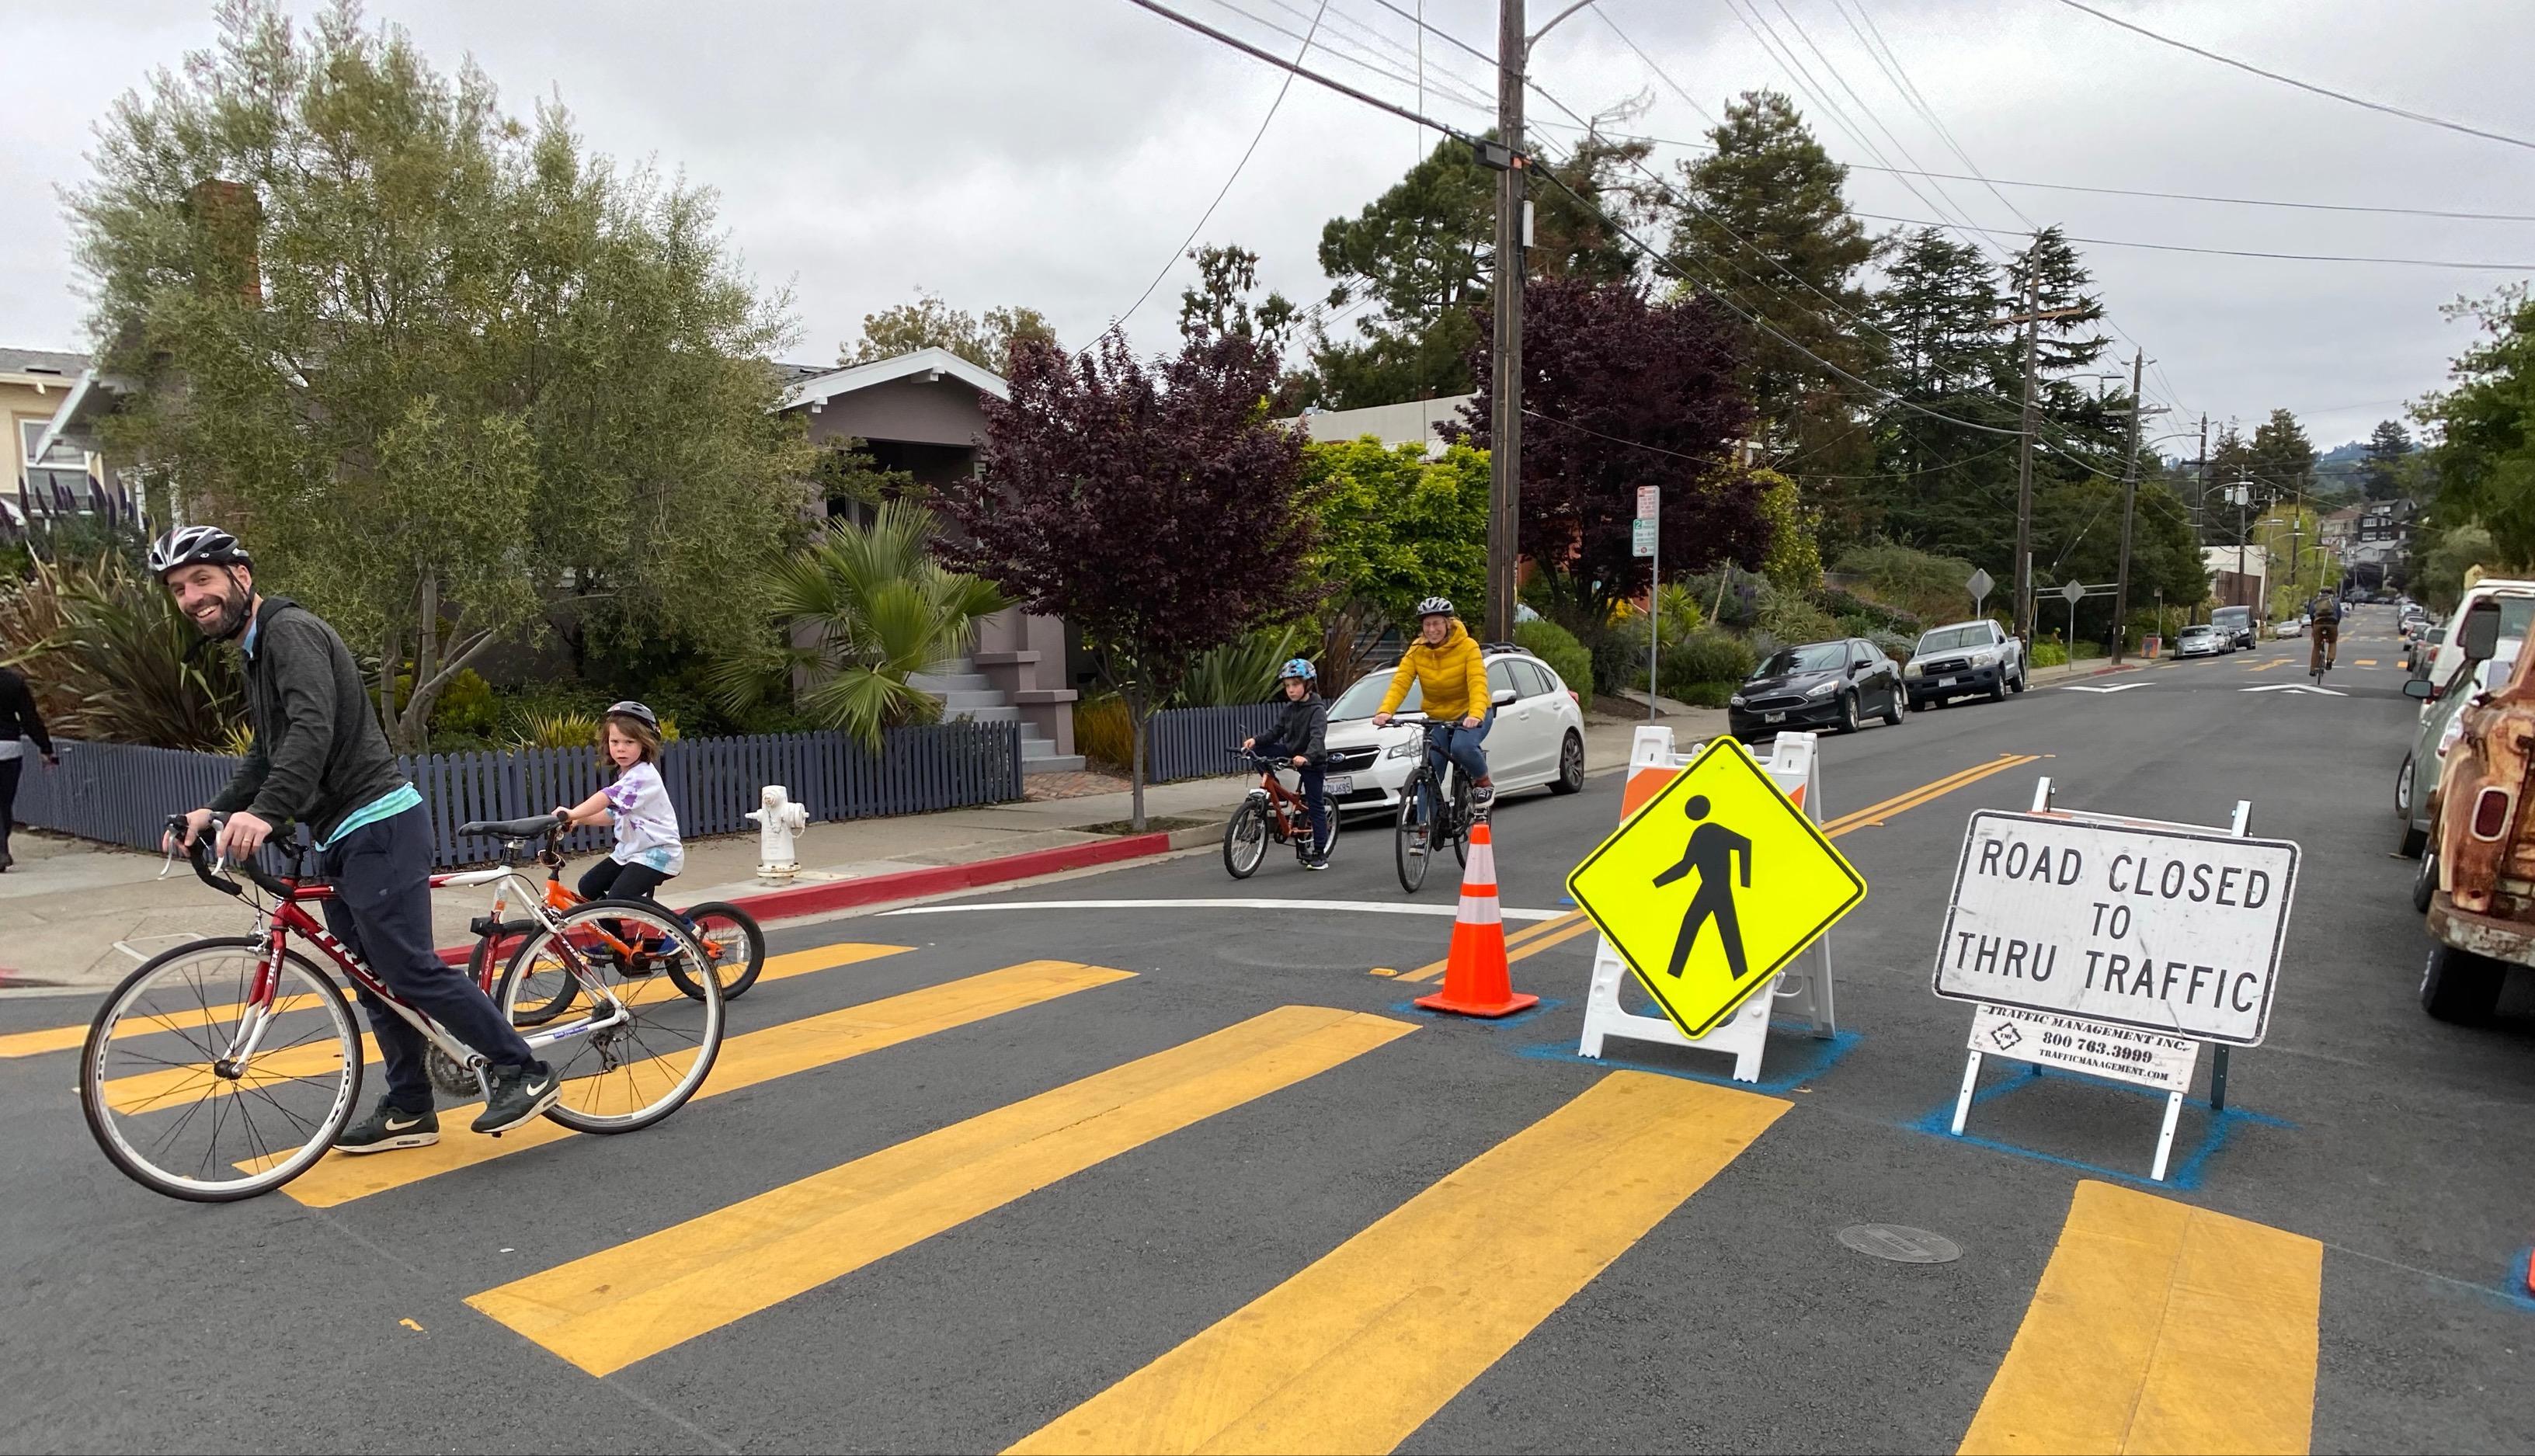 A slow street scene from Oakland, California